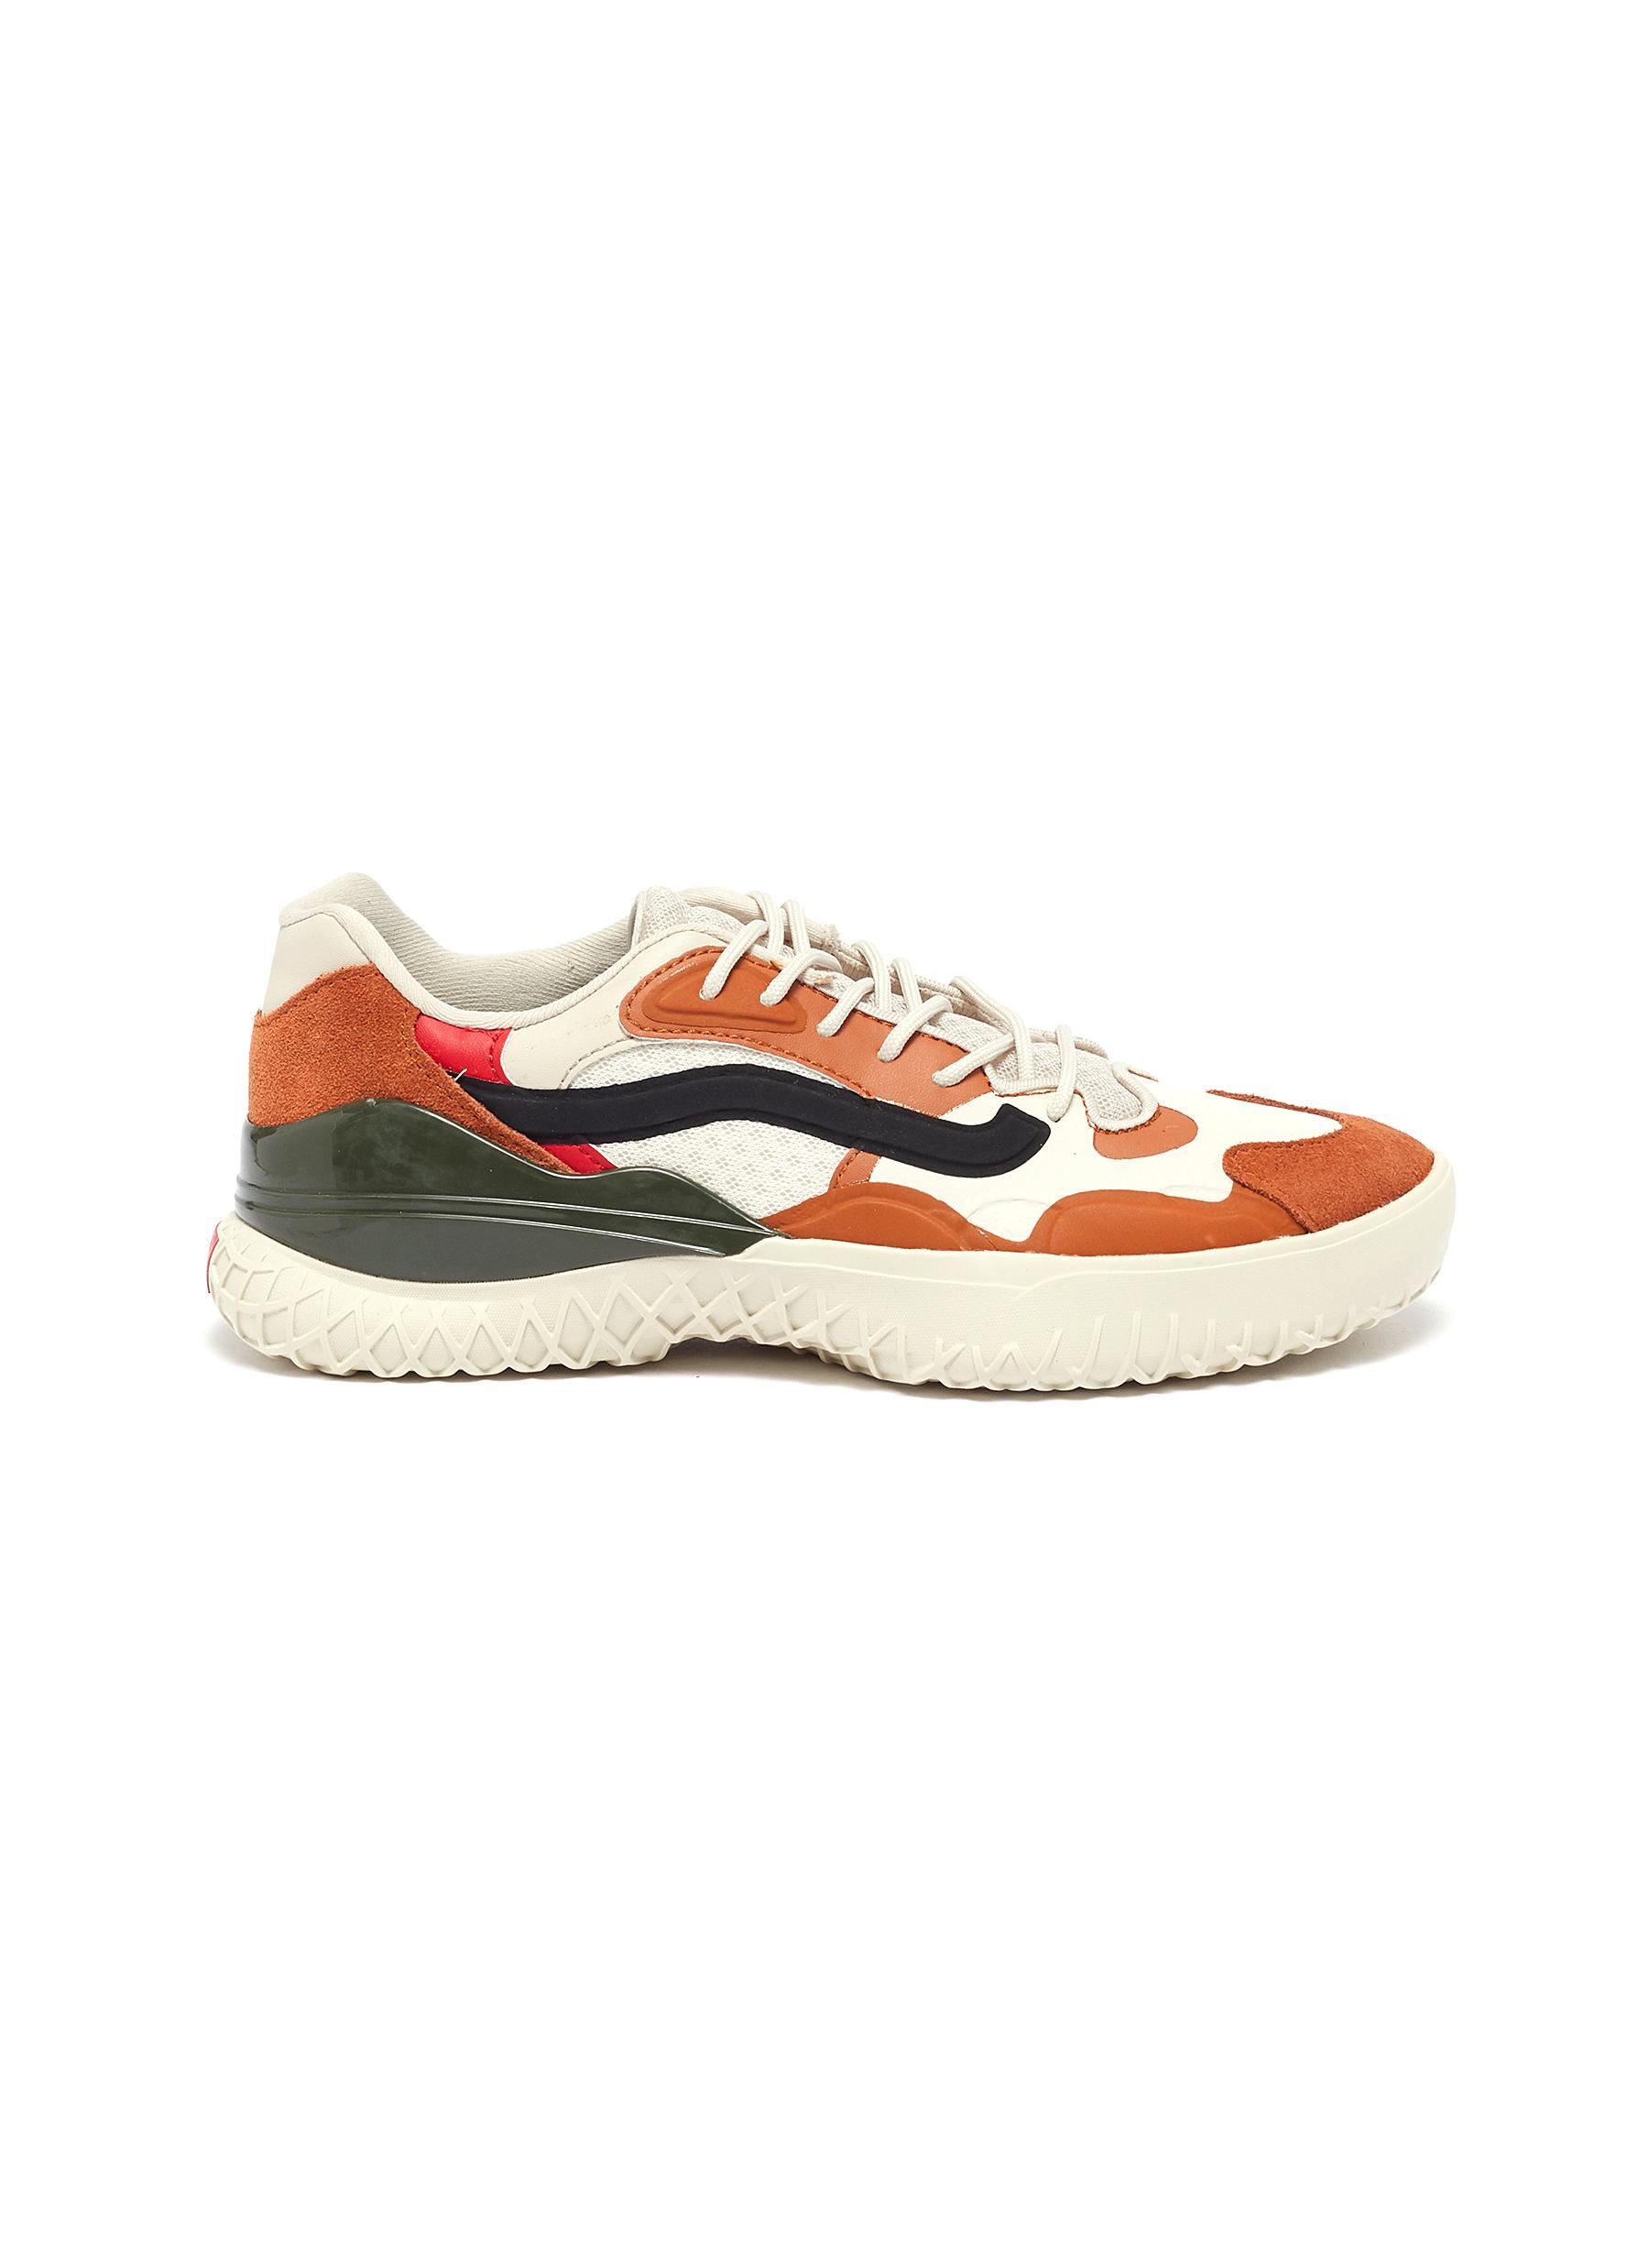 Vans Sneakers City Trl patchwork sneakers